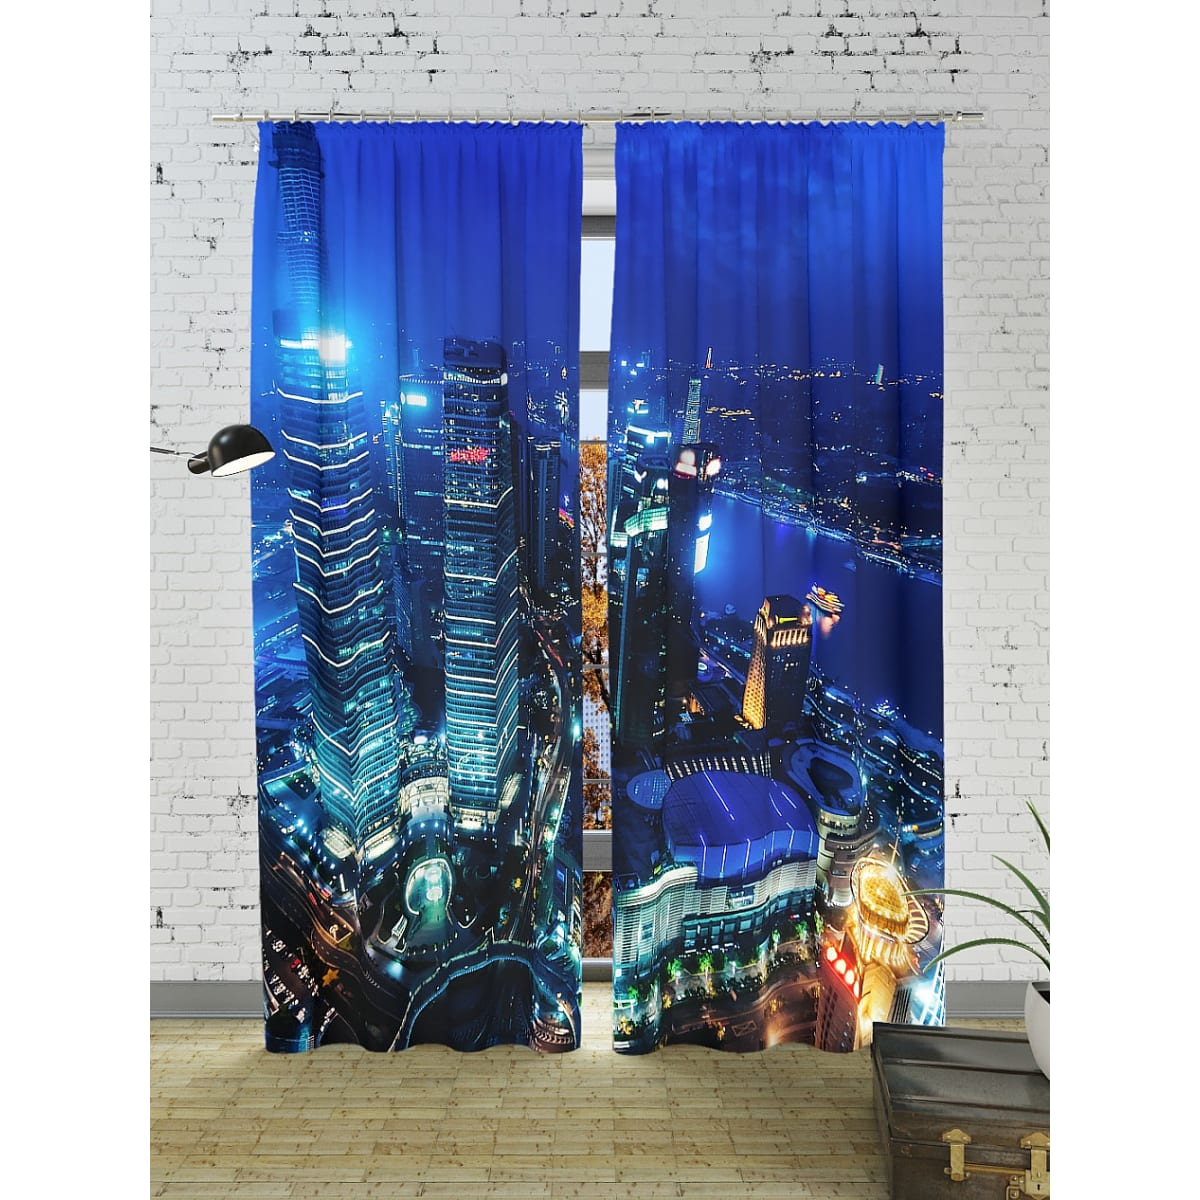 Комплект штор ТОМДОМ Огни ночного мегаполиса 900178, 260 см